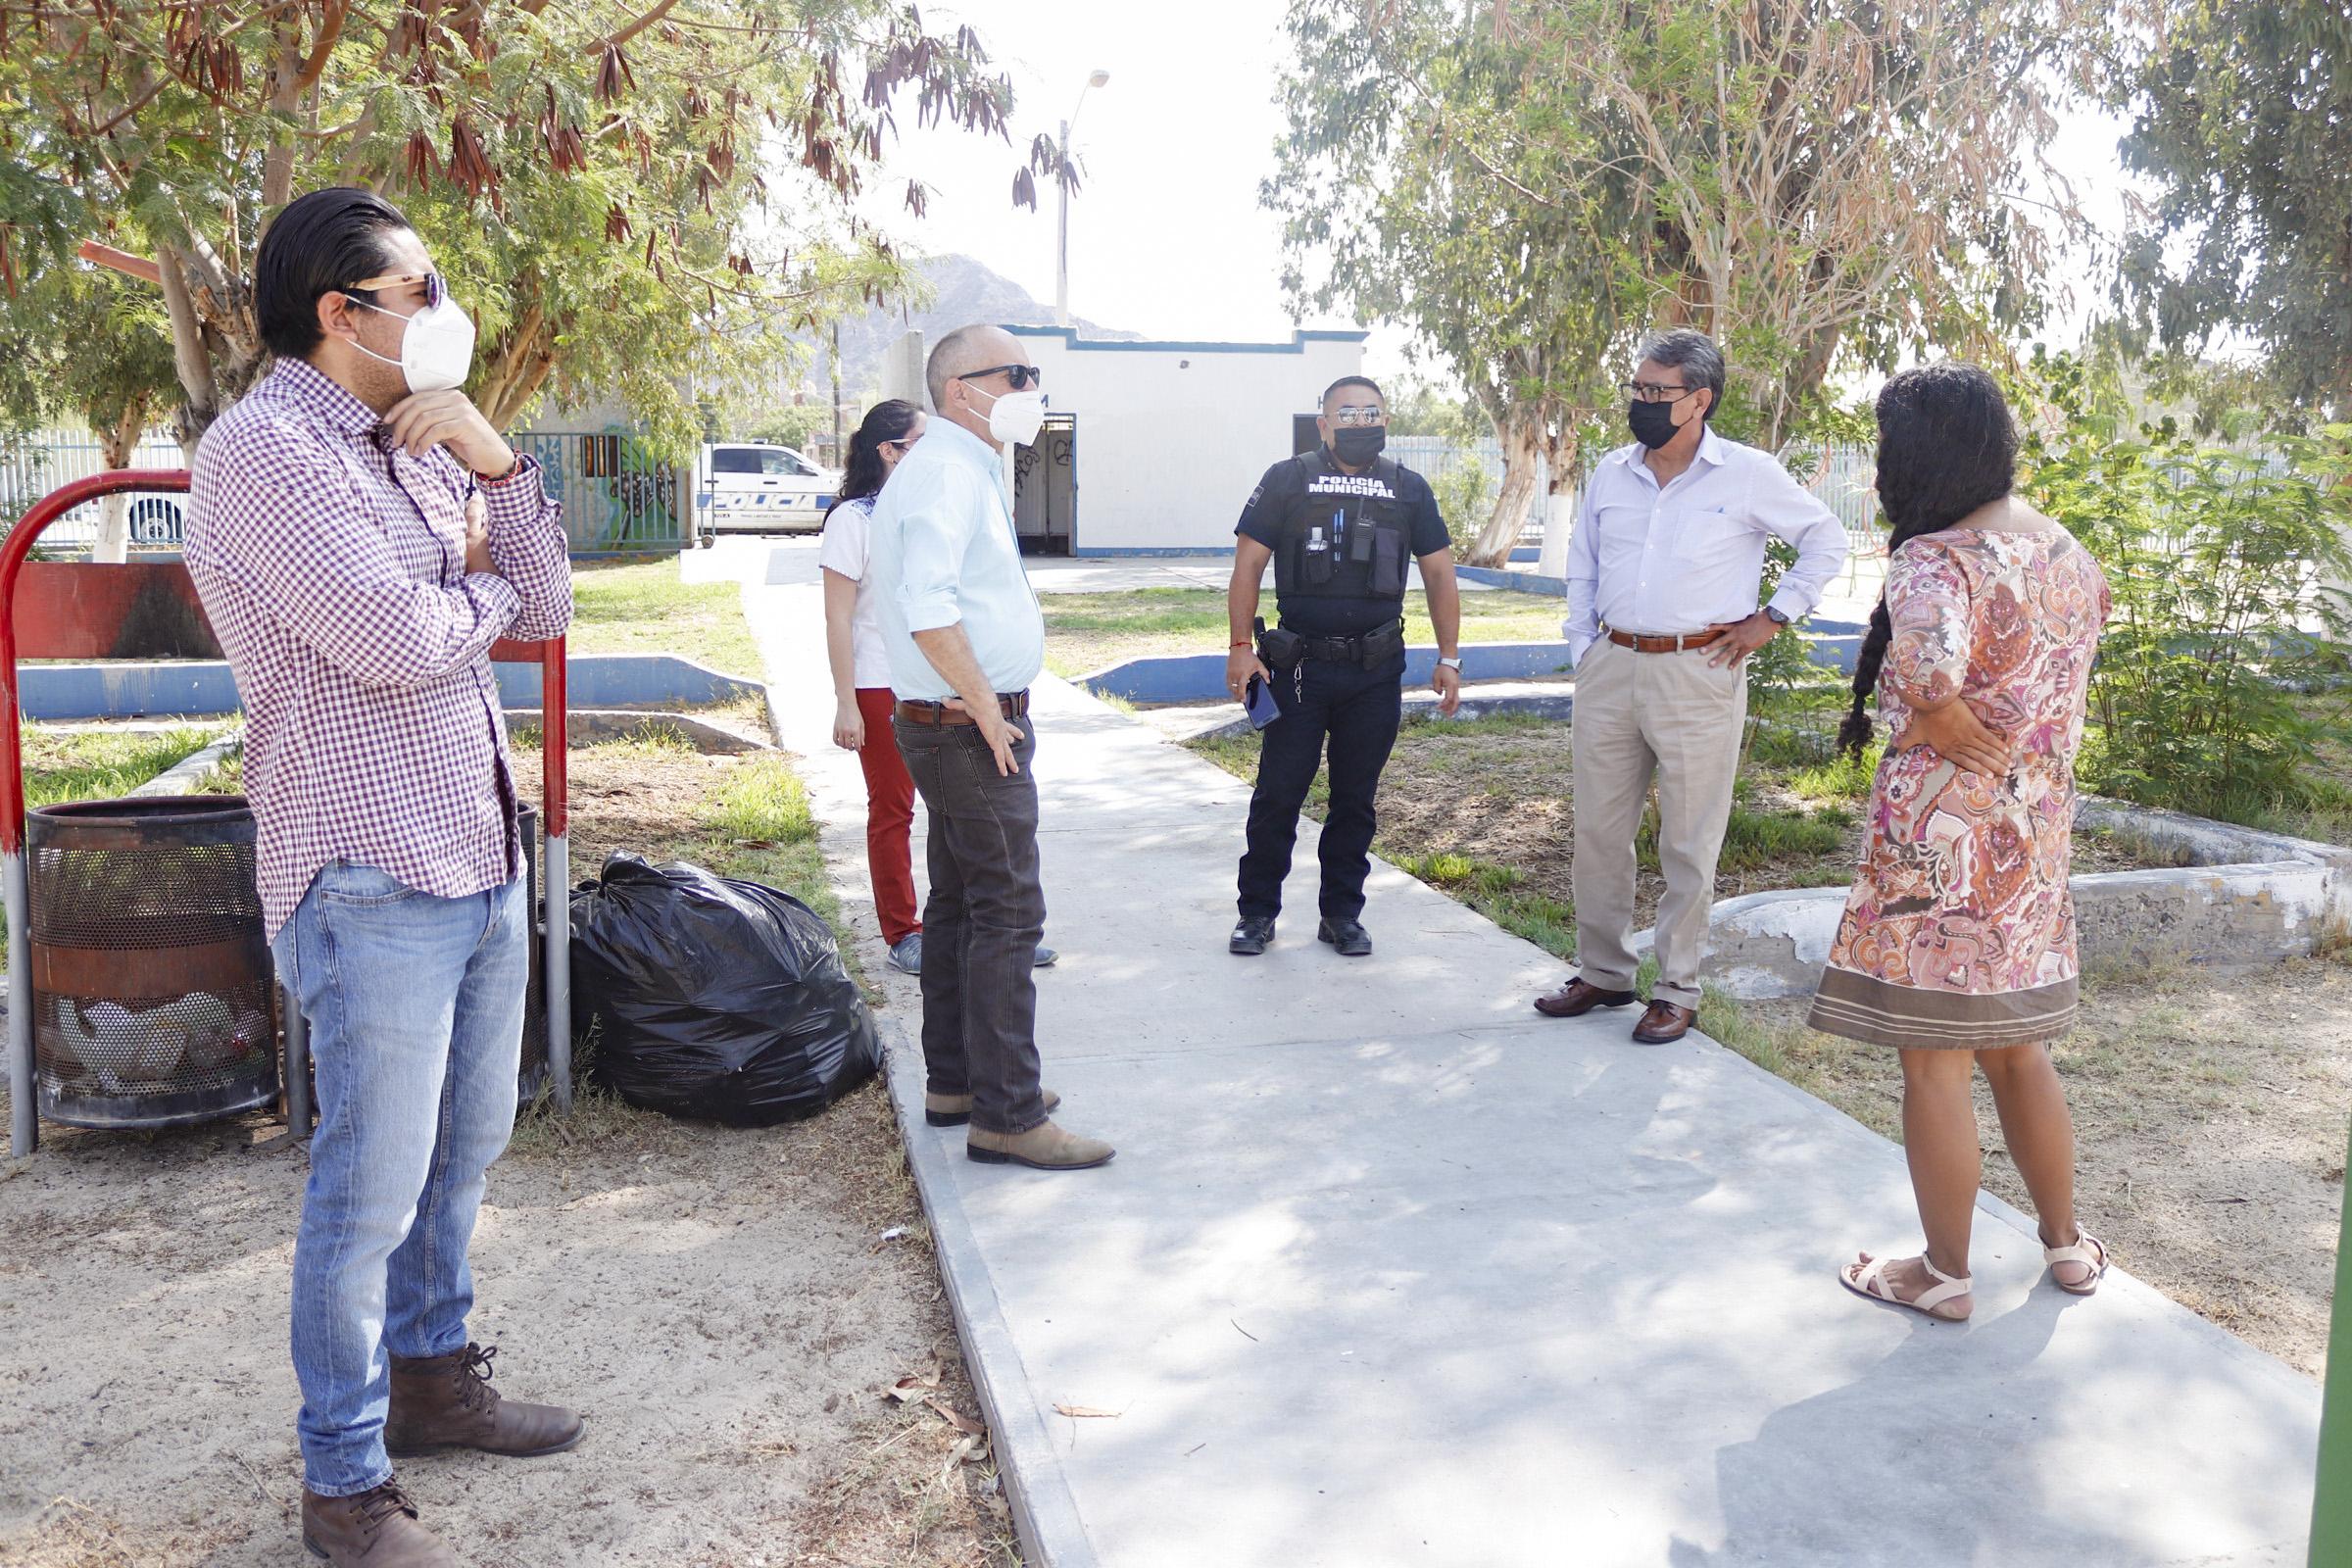 ENPA e Imjuve inician mesas de trabajo para intervenciones en San Felipe, Baja California